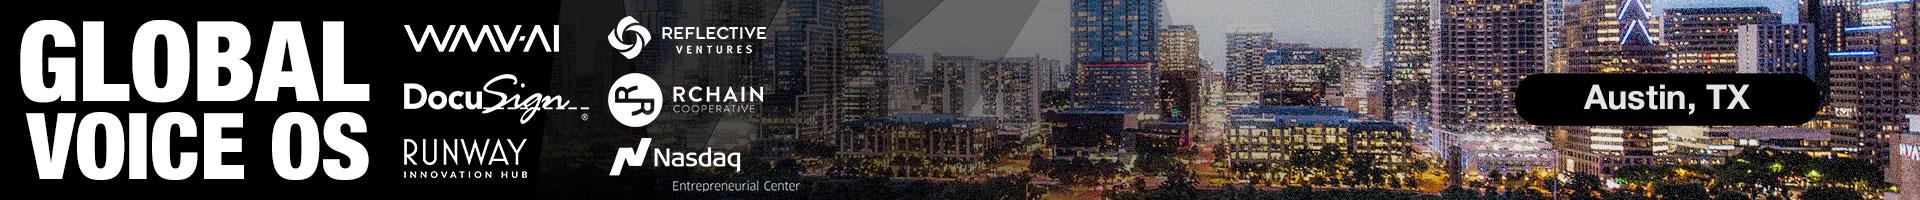 Event-Global-Voice-OS-1920x200-Austin-TX